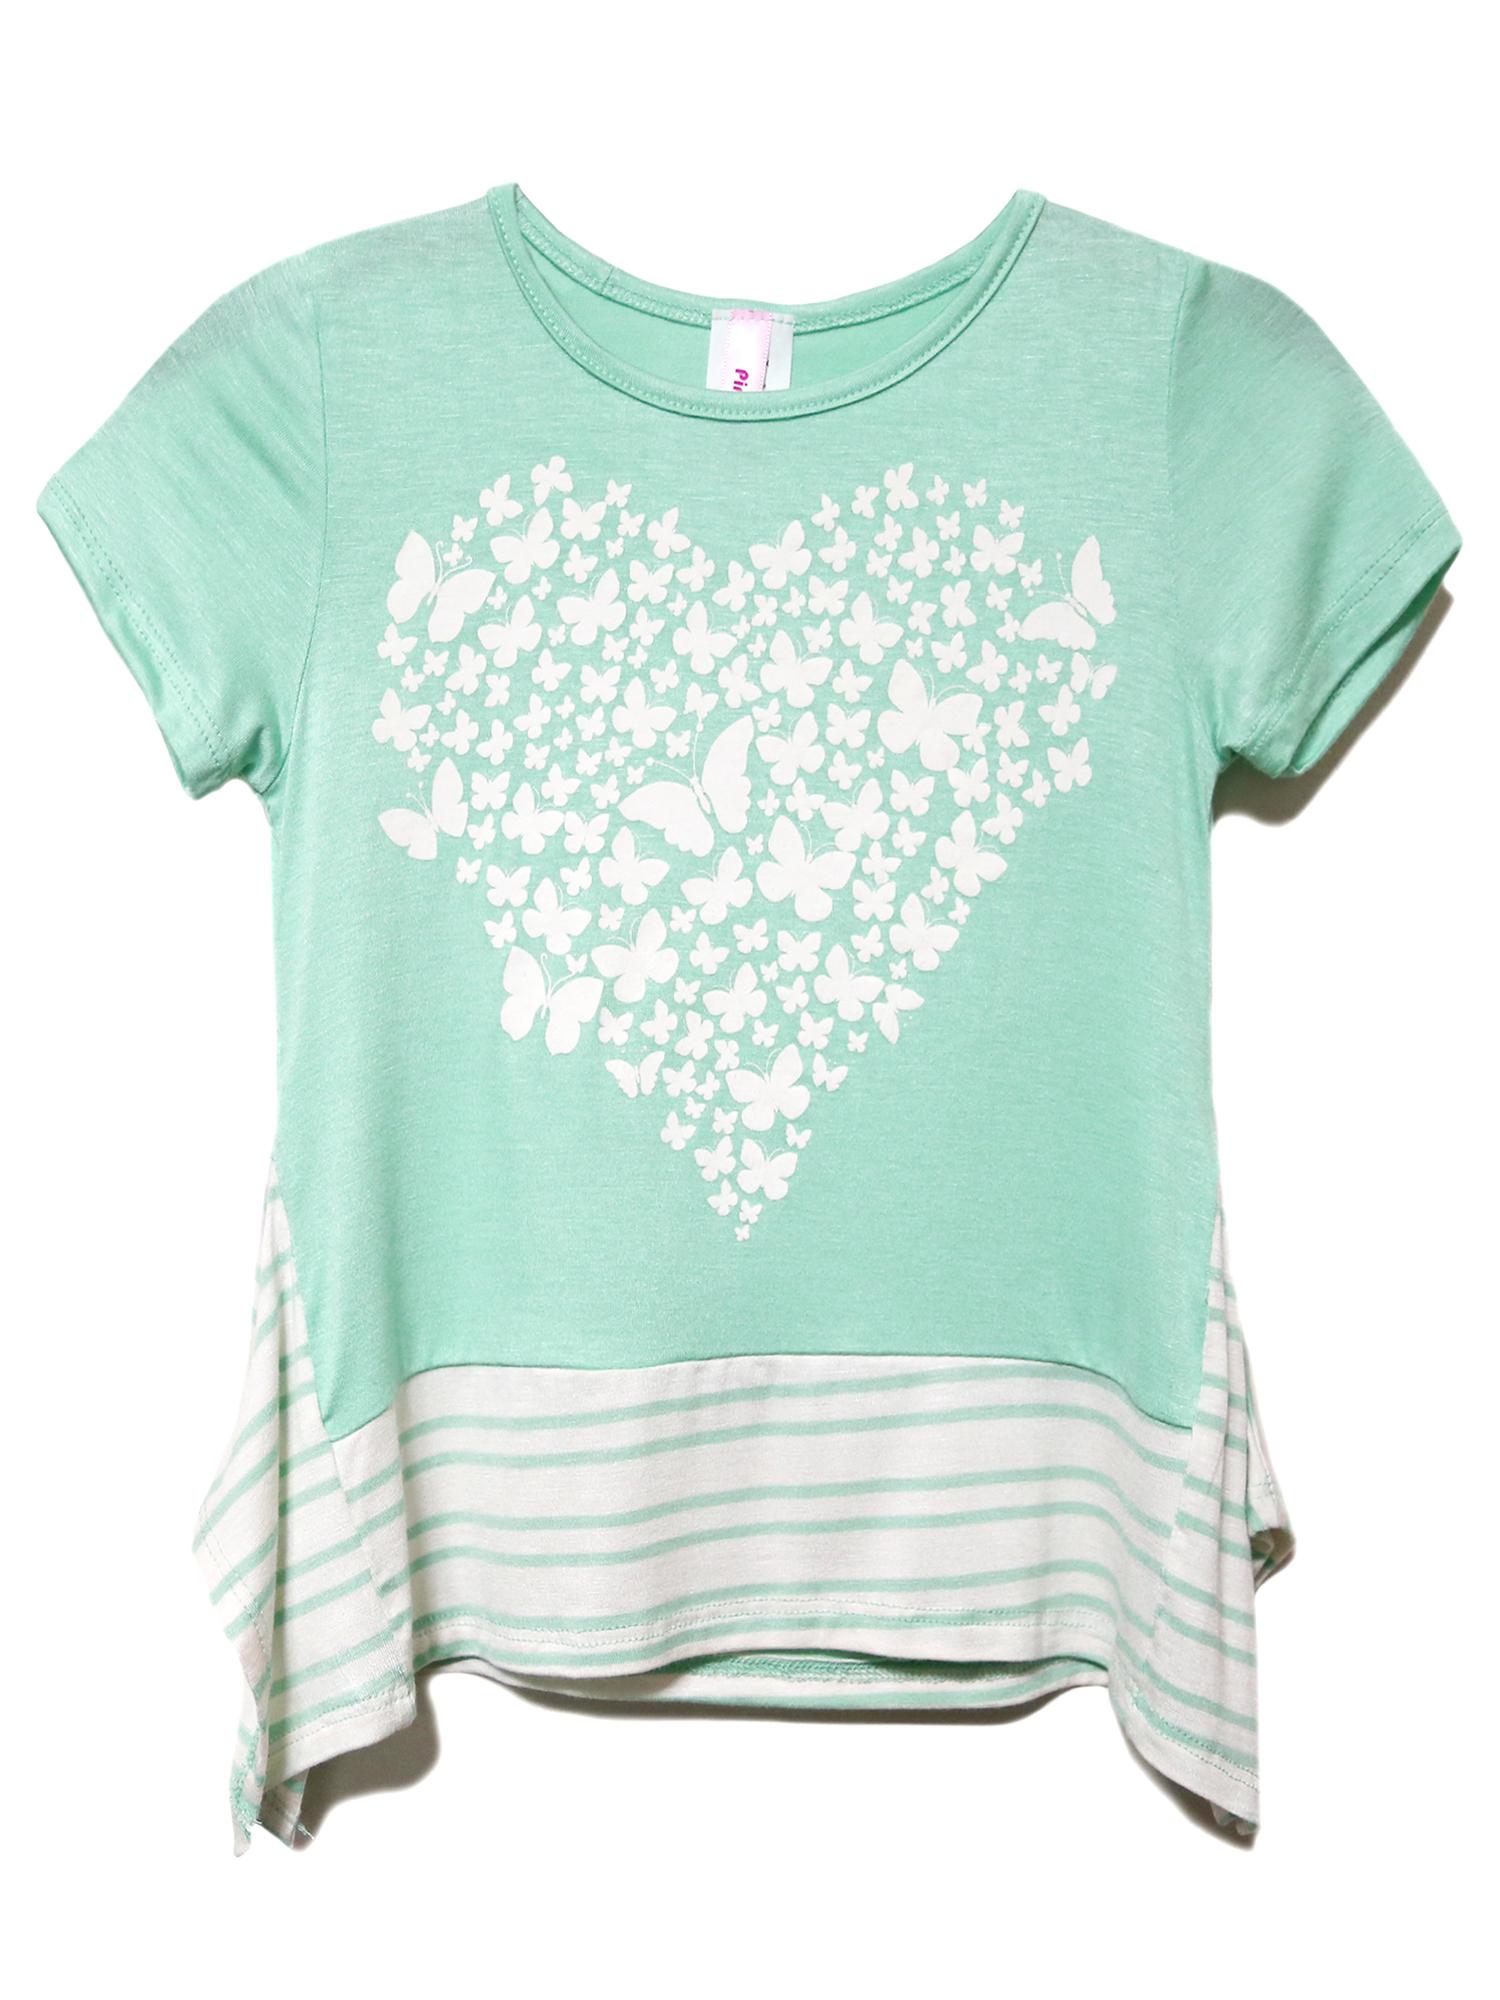 BASICO Girl's USA Short Sleeve T Shirts Graphic Printed Tees